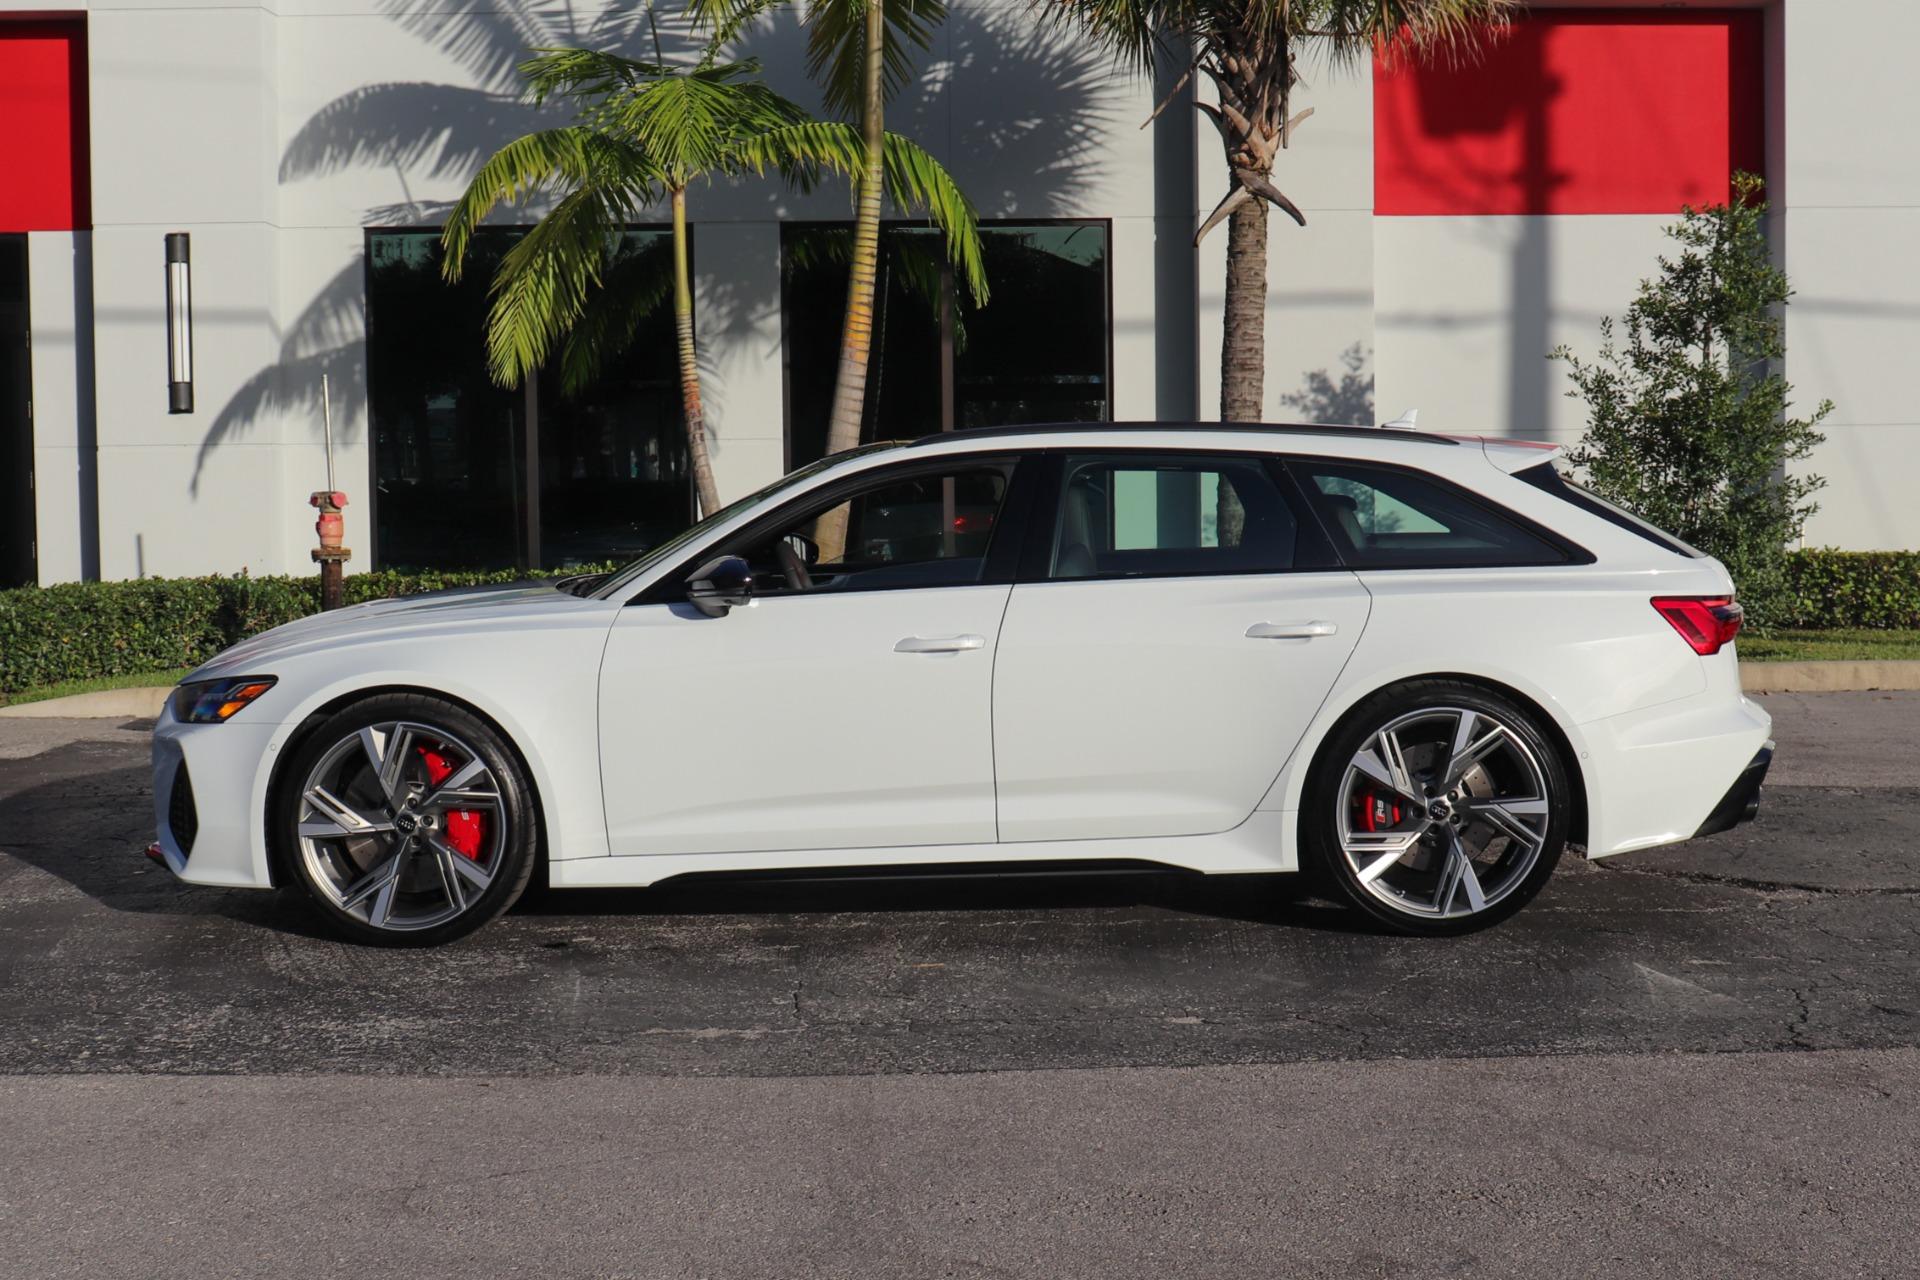 Used 2021 Audi RS 6 4.0T quattro Avant For Sale ($134,900 ...